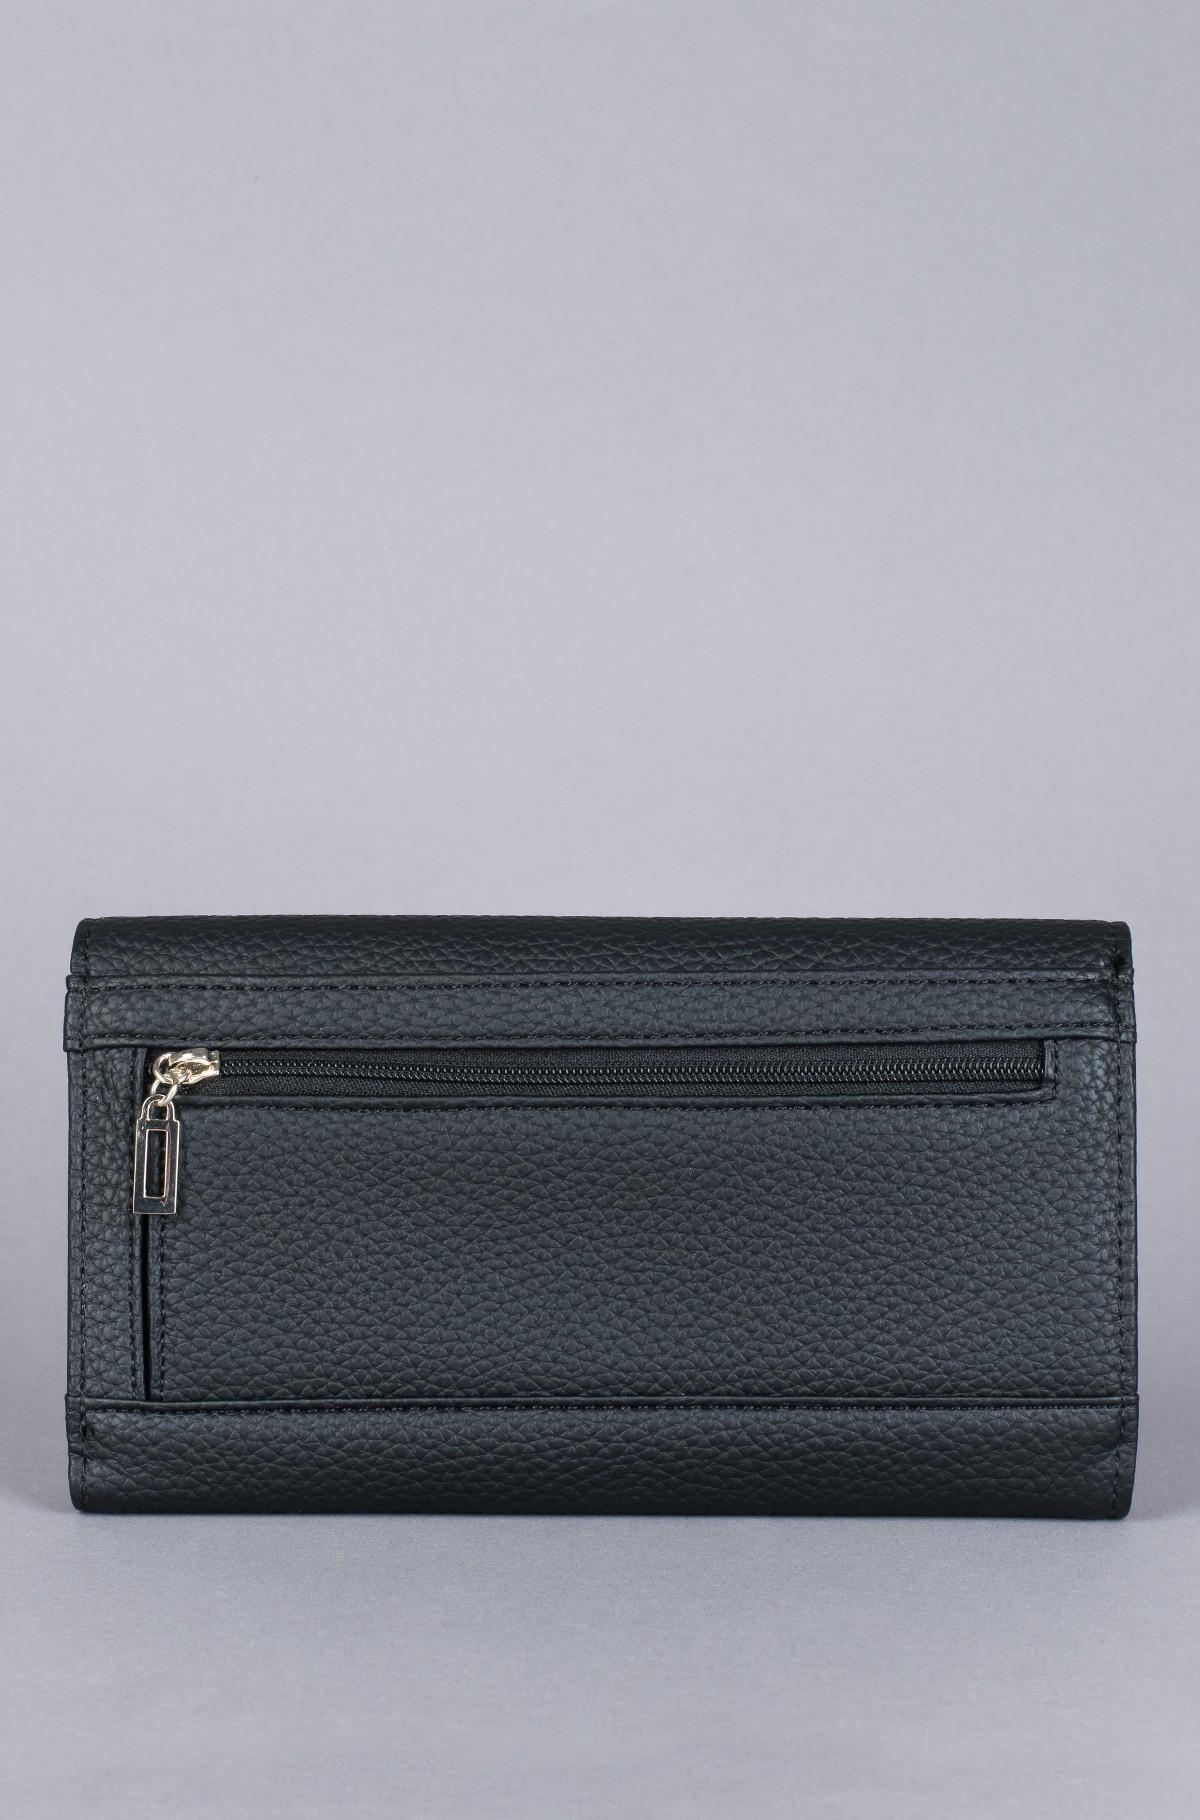 Wallet SWVG73 01650-full-2